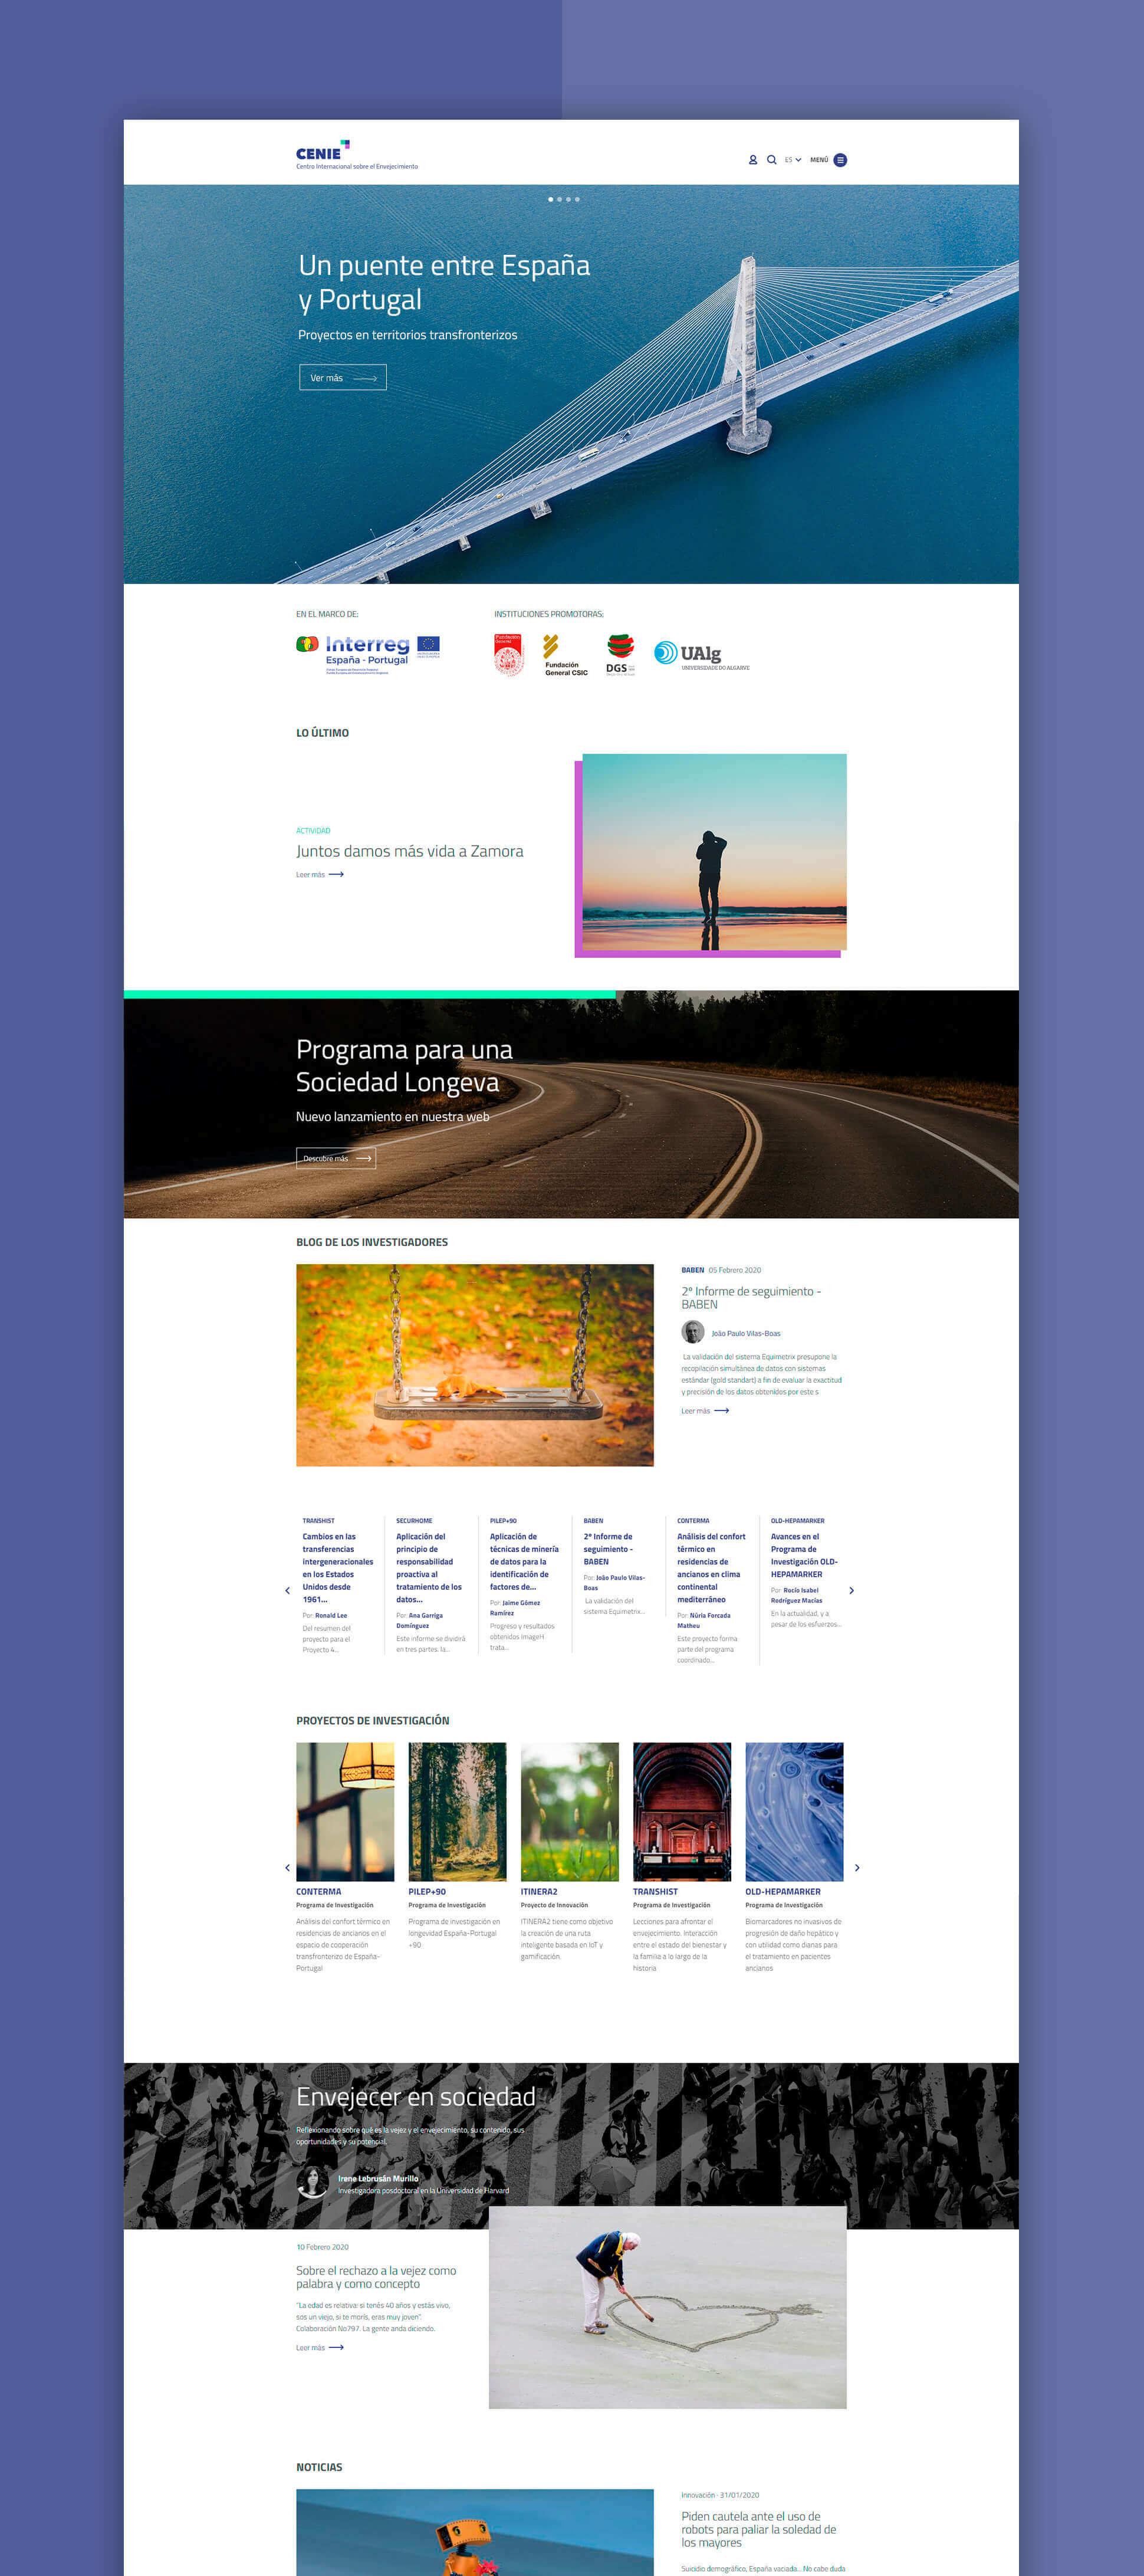 Mockup web cenie.eu